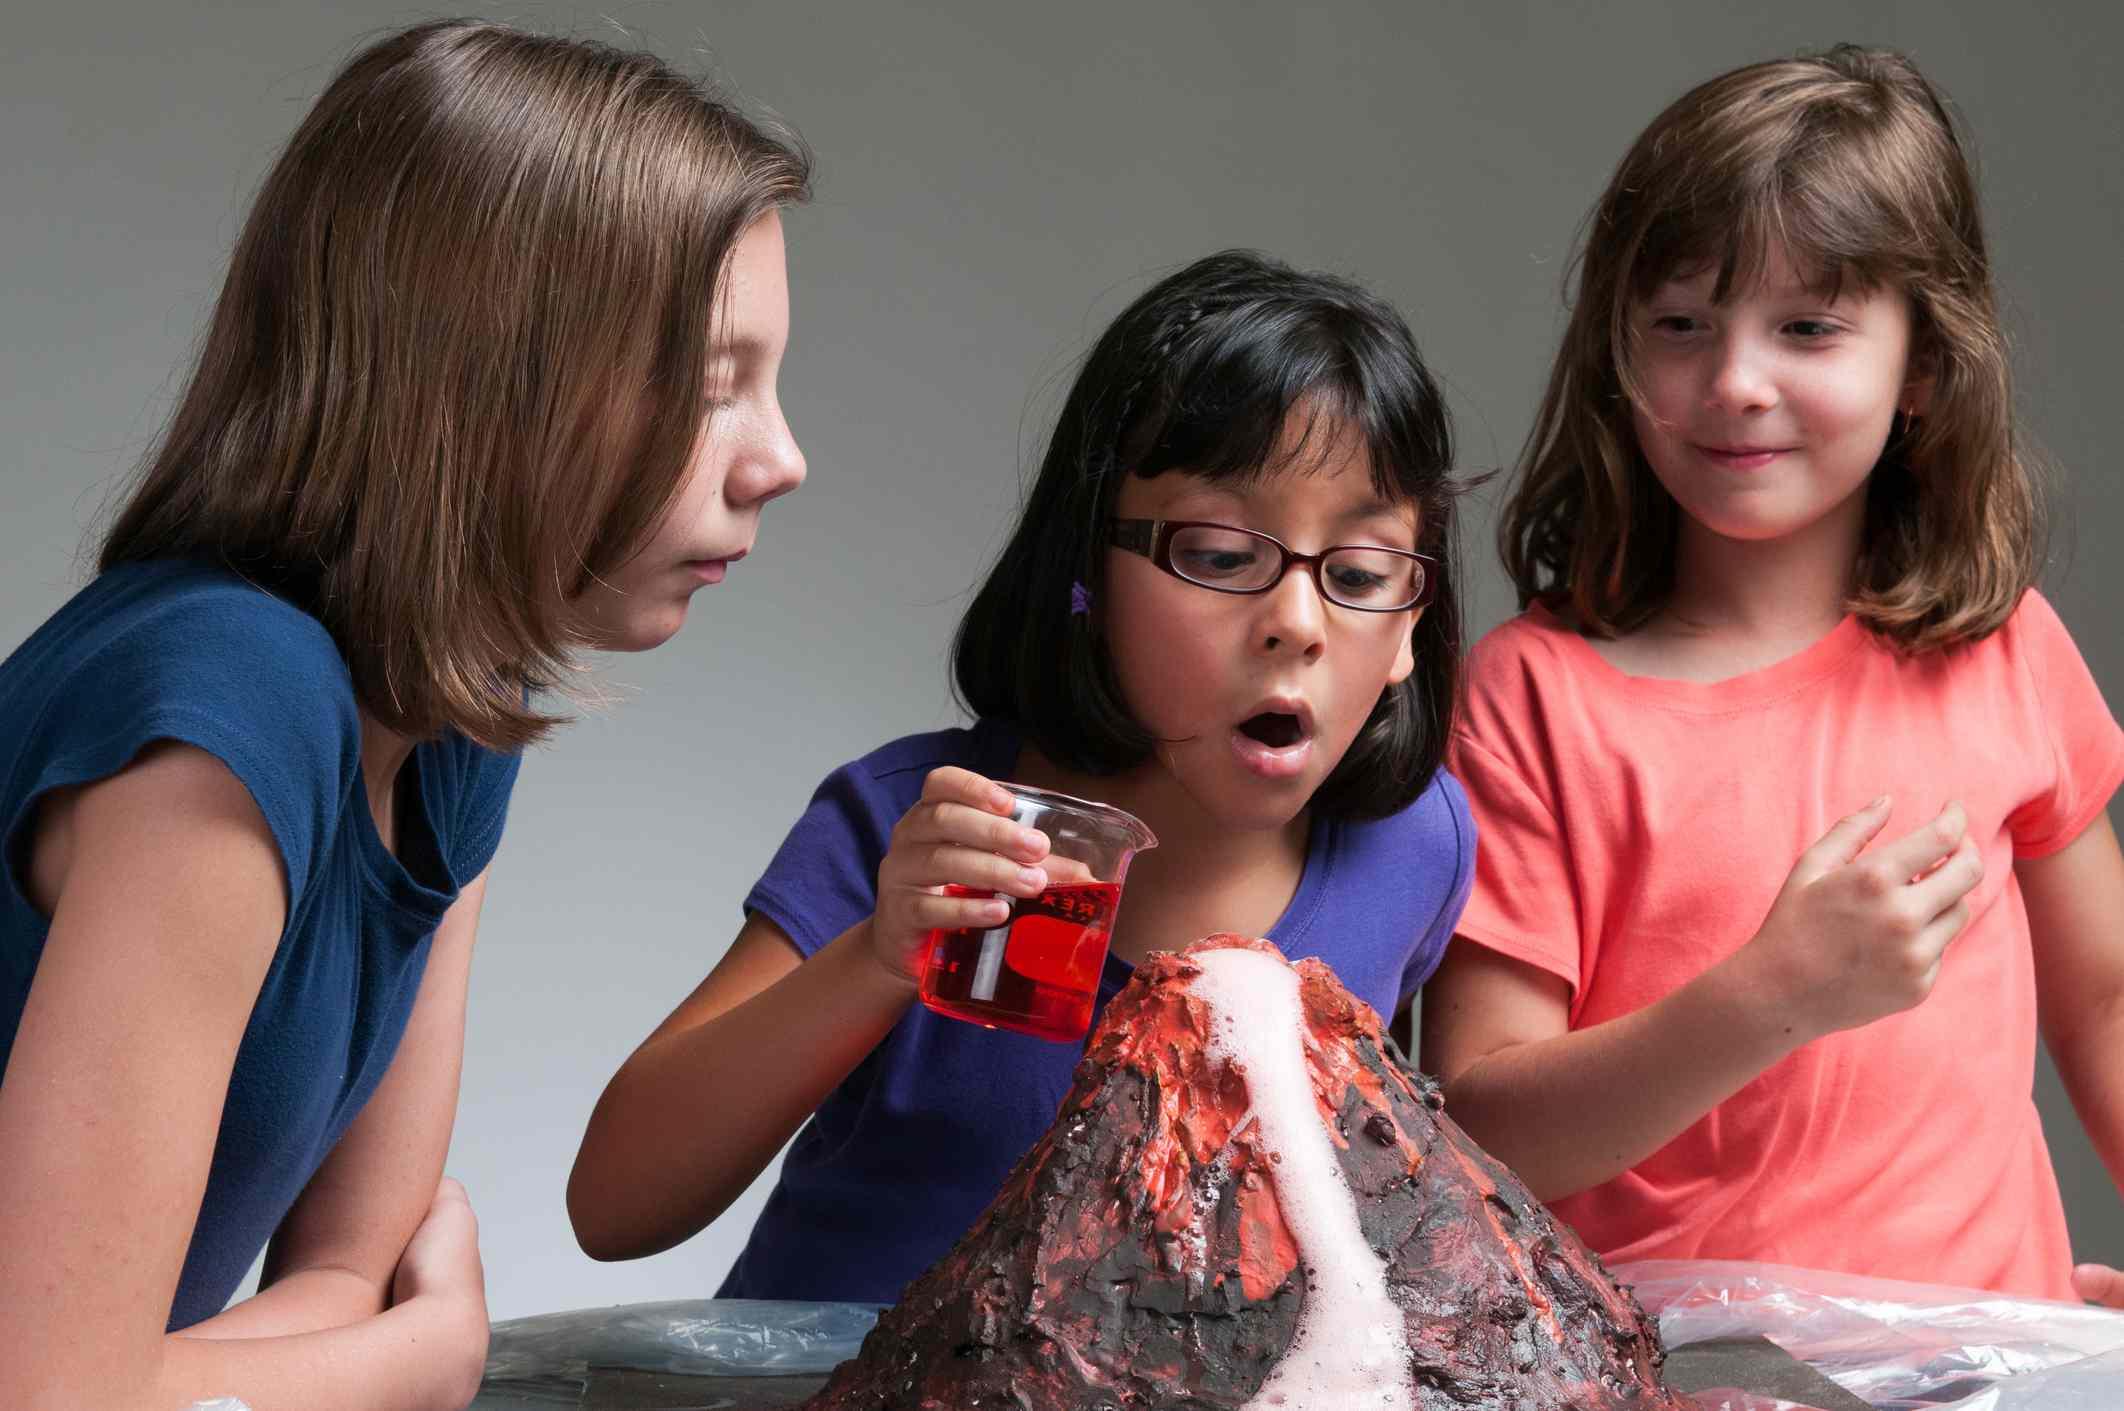 Three young school girls watch a model volcano erupt.